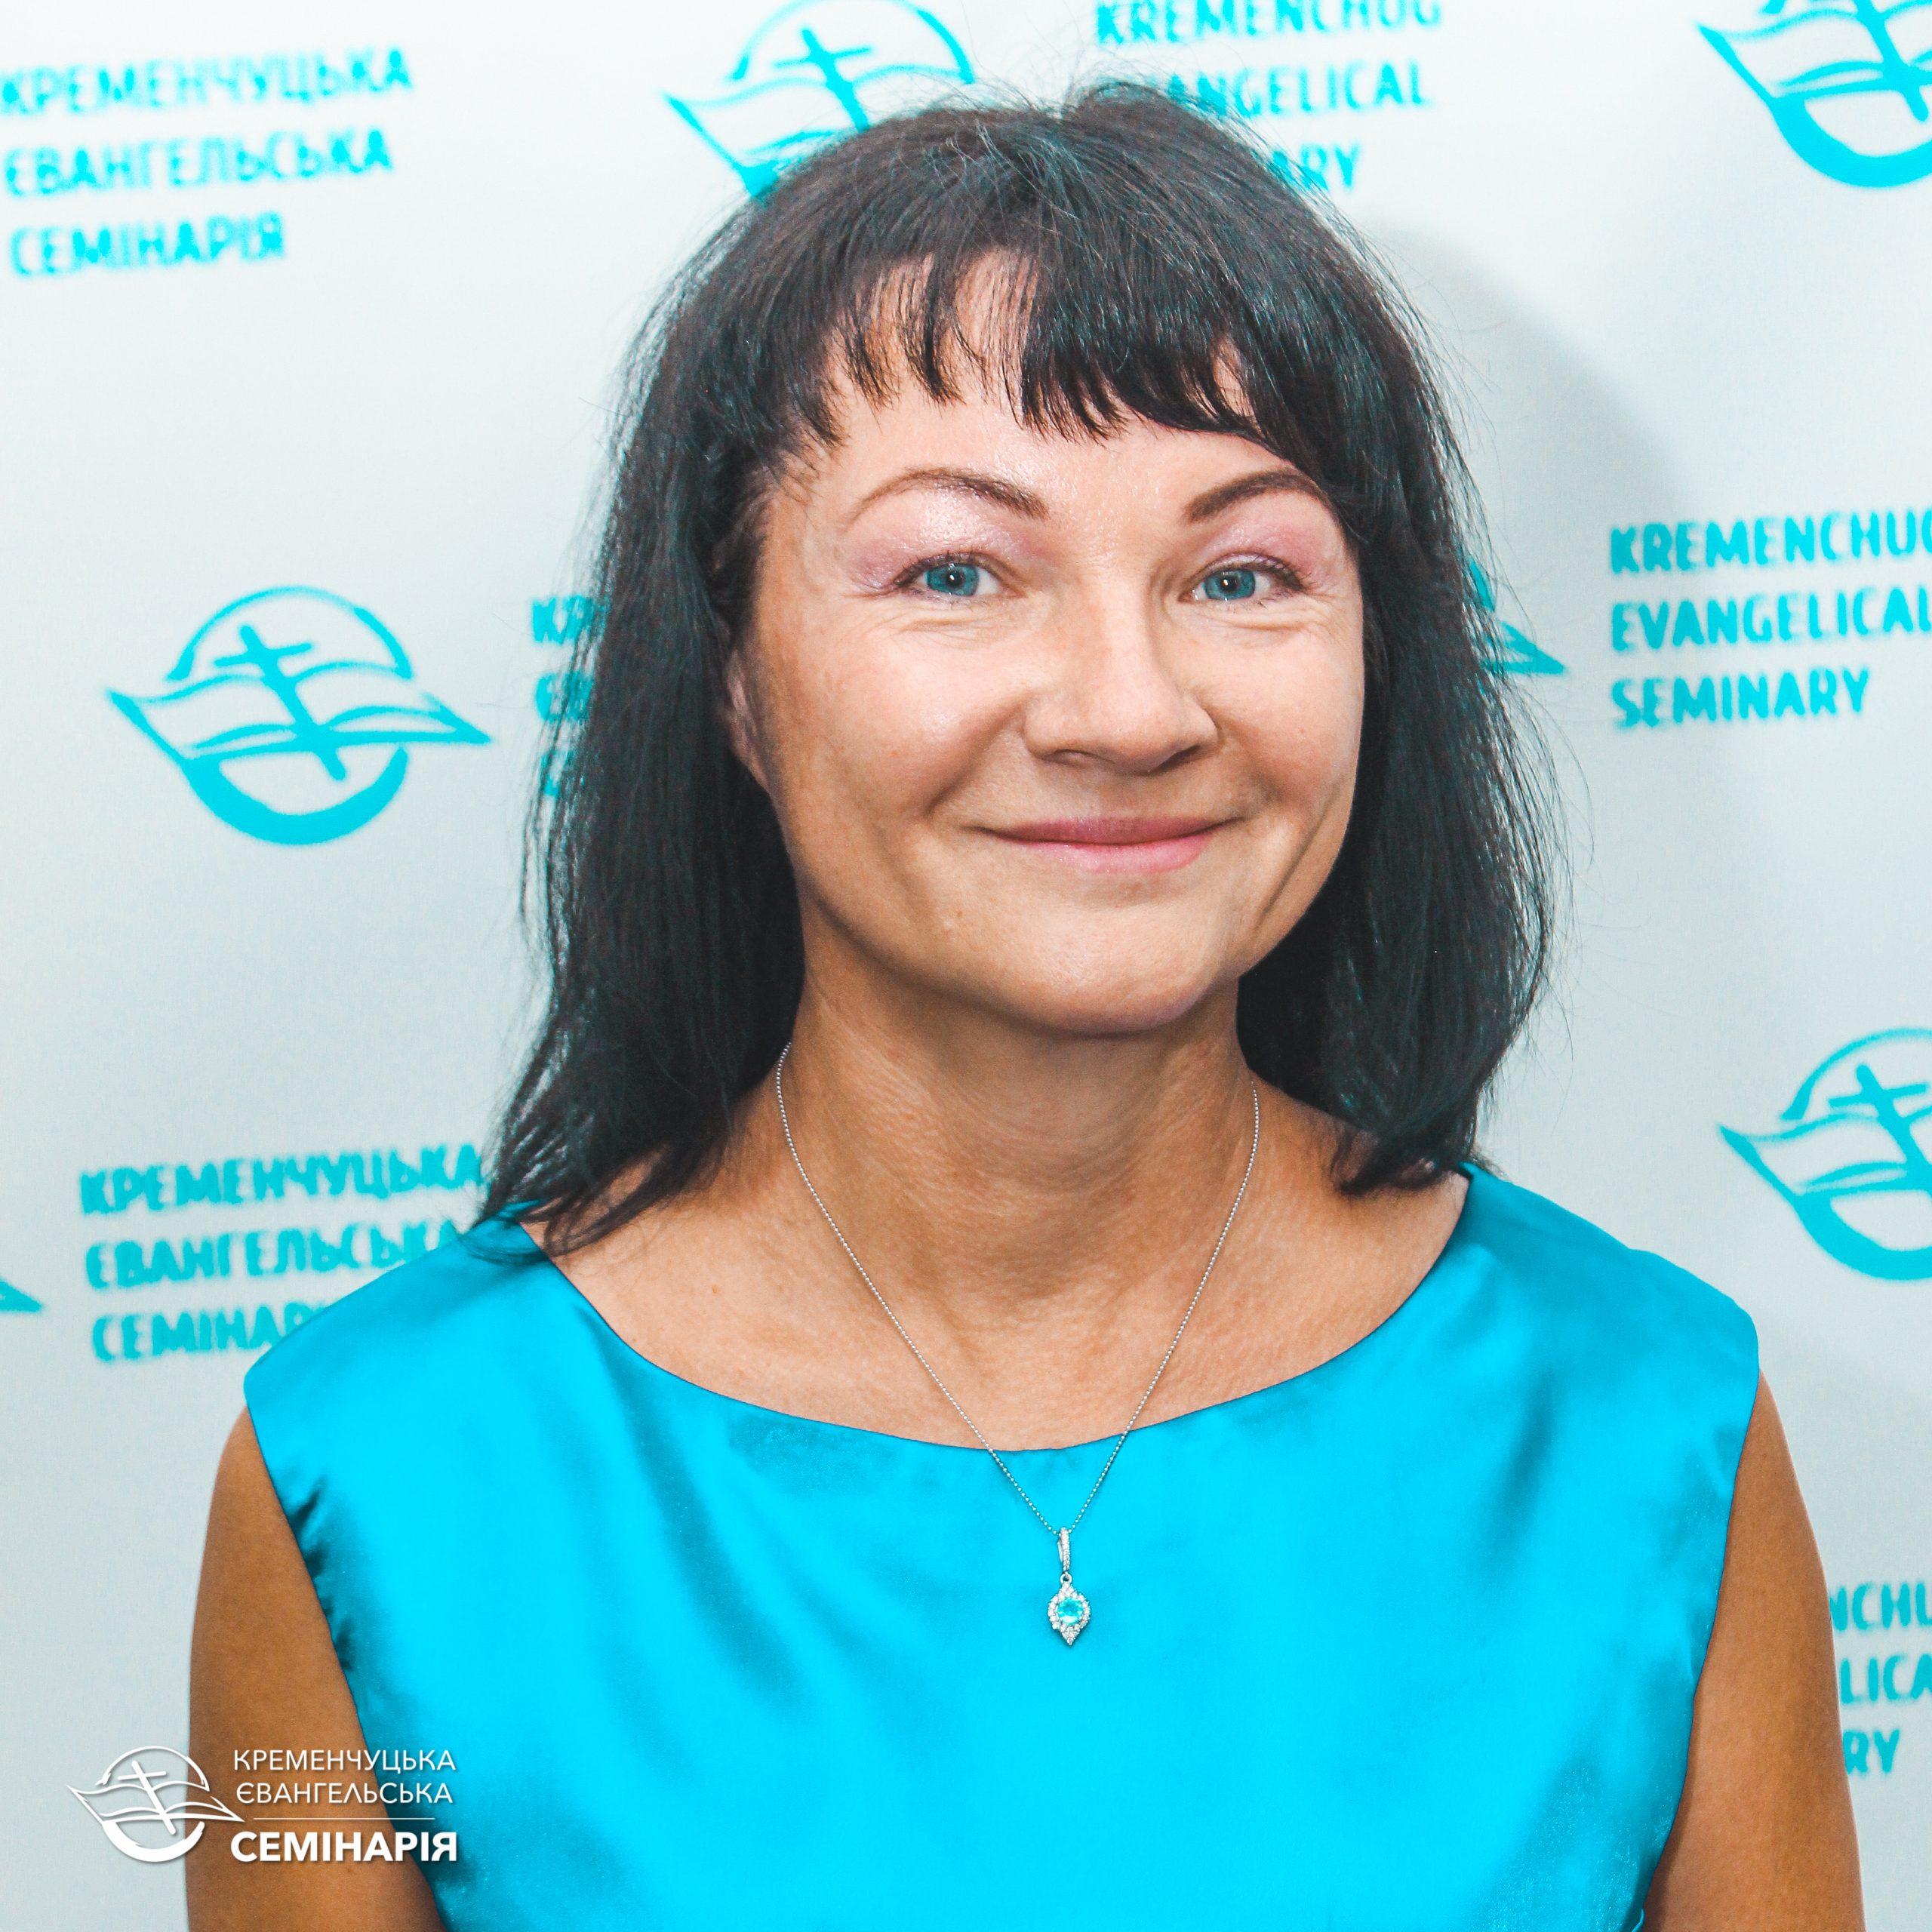 Нефёдова Наталья Викторовна